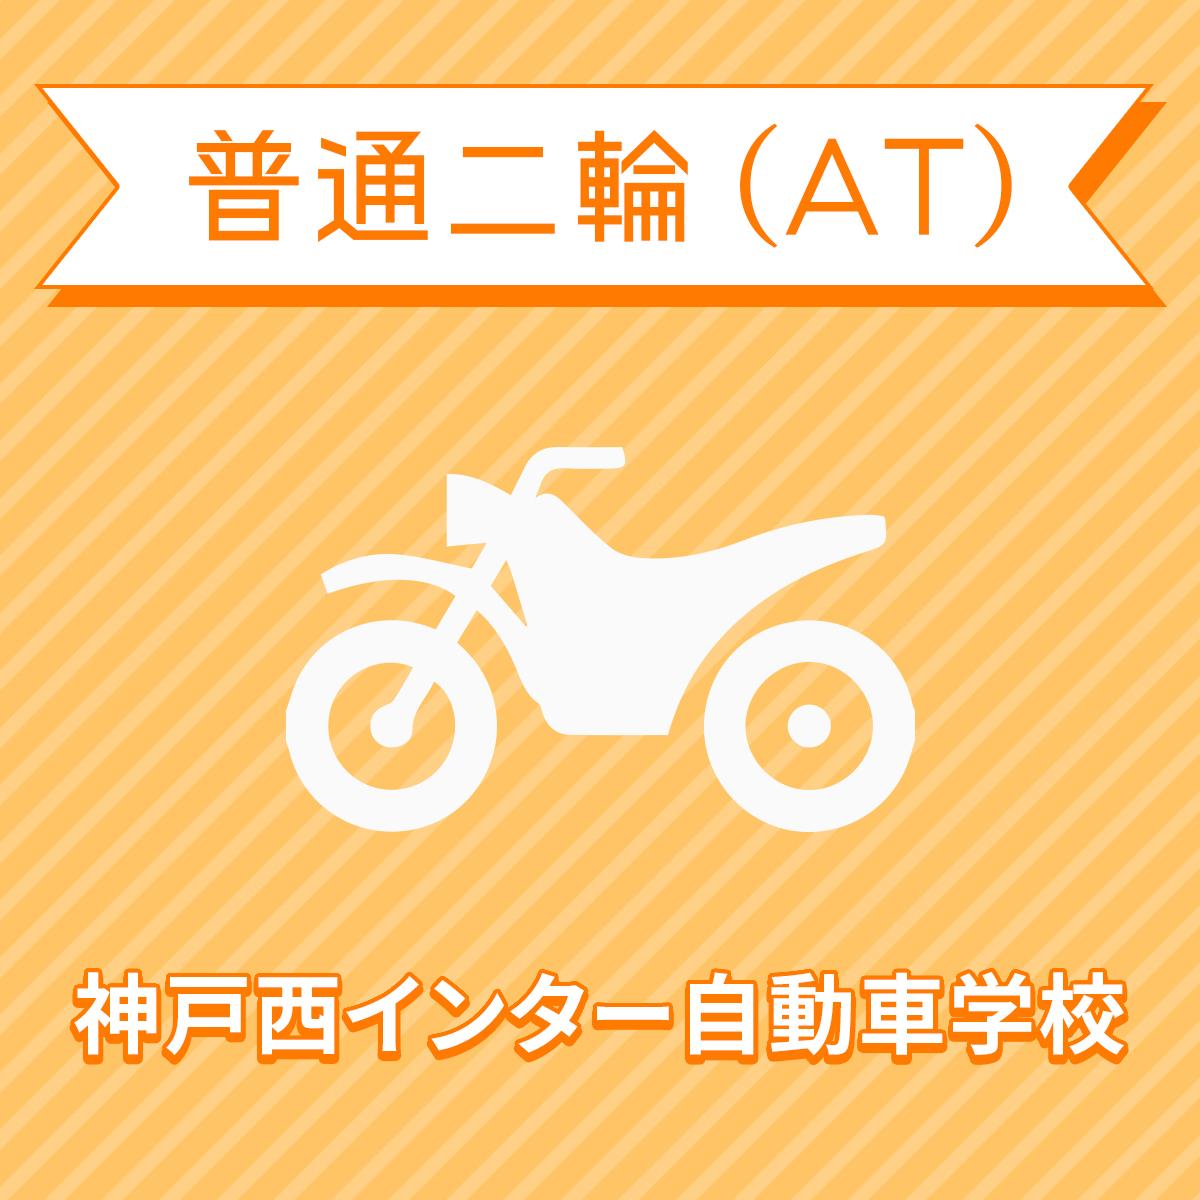 【兵庫県神戸市】普通二輪ATコース(一般料金)<免許なし/原付免許所持対象>